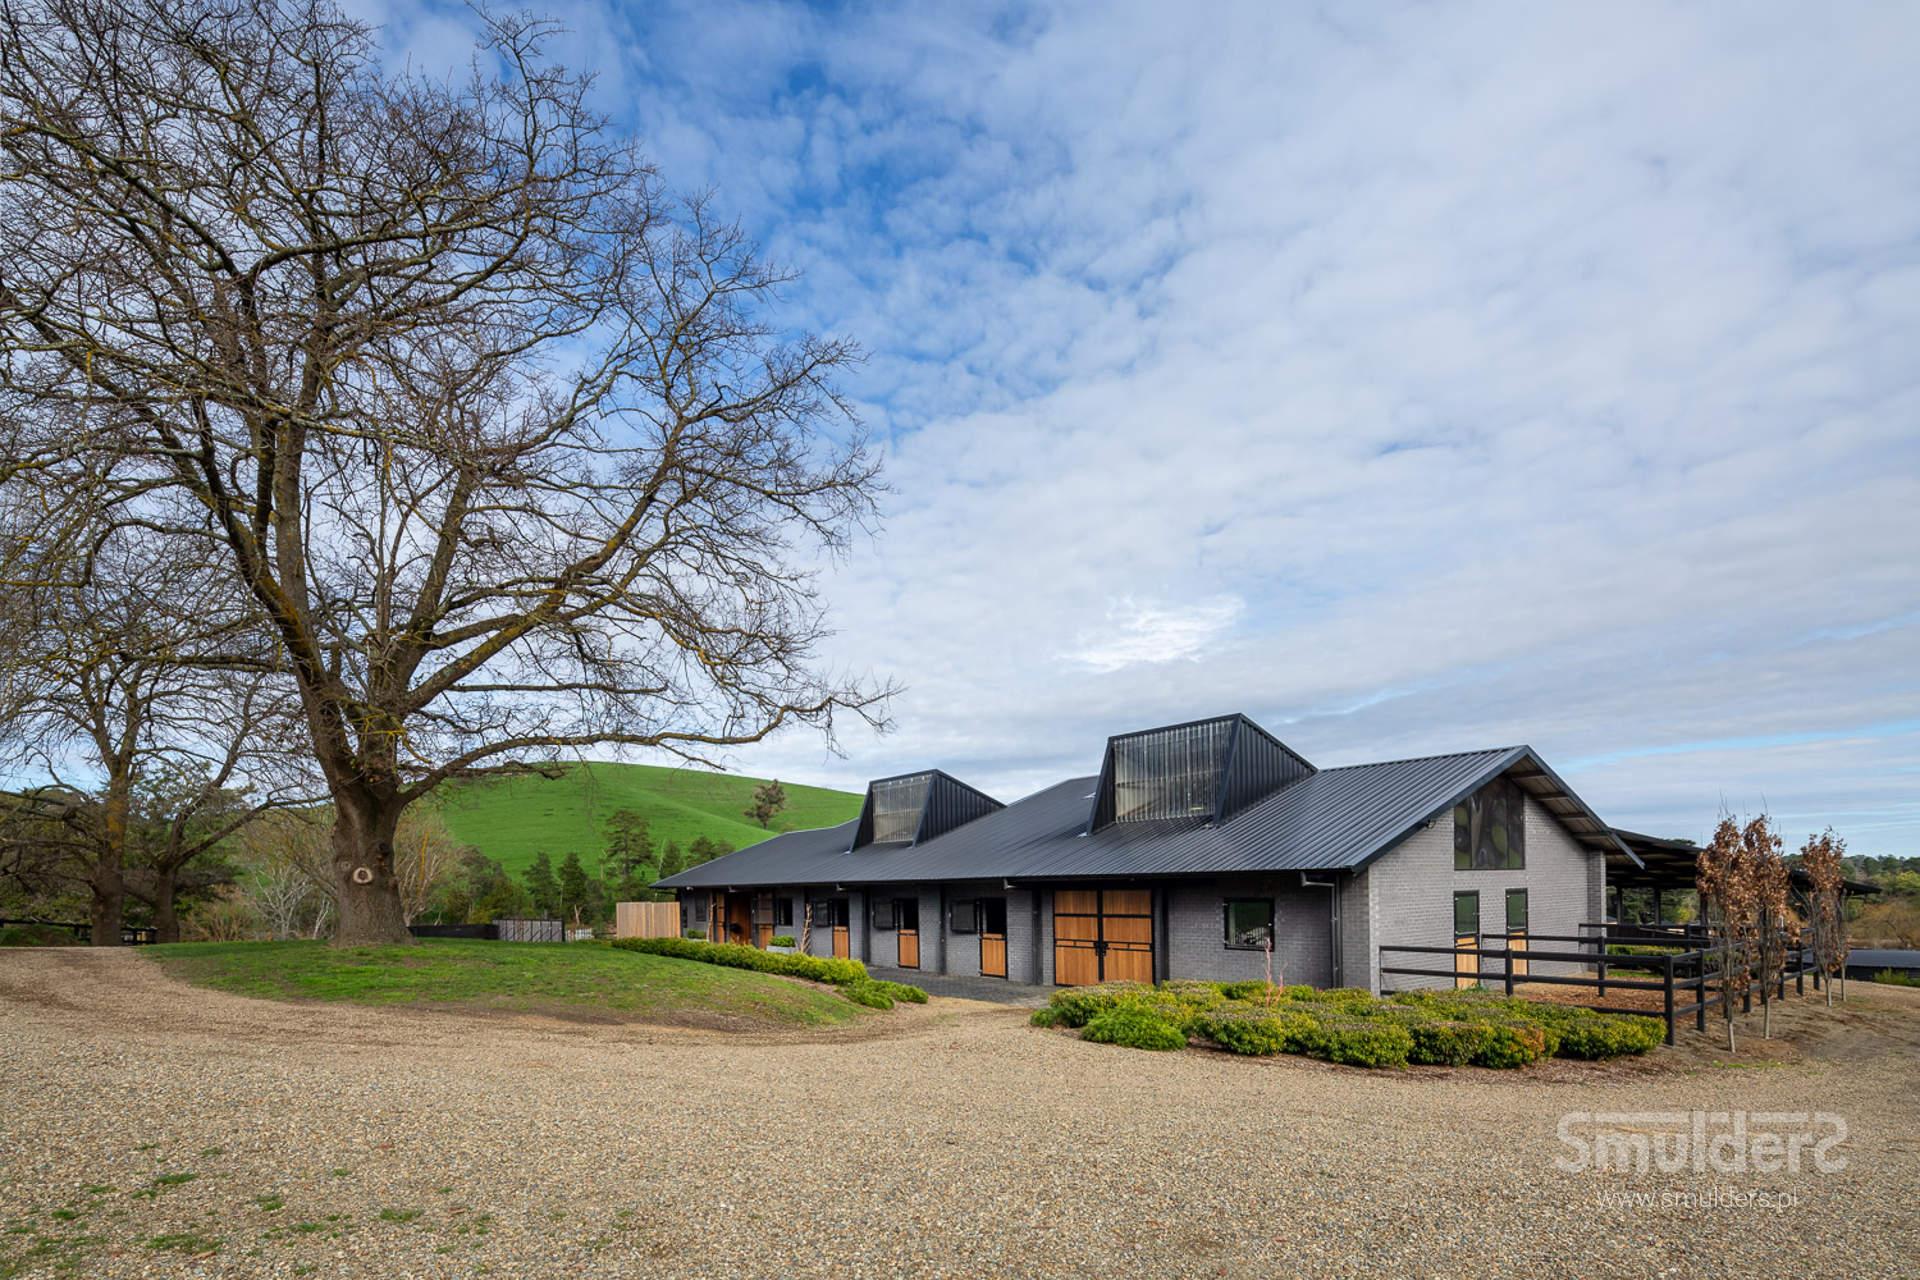 http://www.smulders.pl/wp-content/uploads/2019/10/f002_buckingham_barn-doors_doors_windows_KIL_SMULDERS_PL.jpg